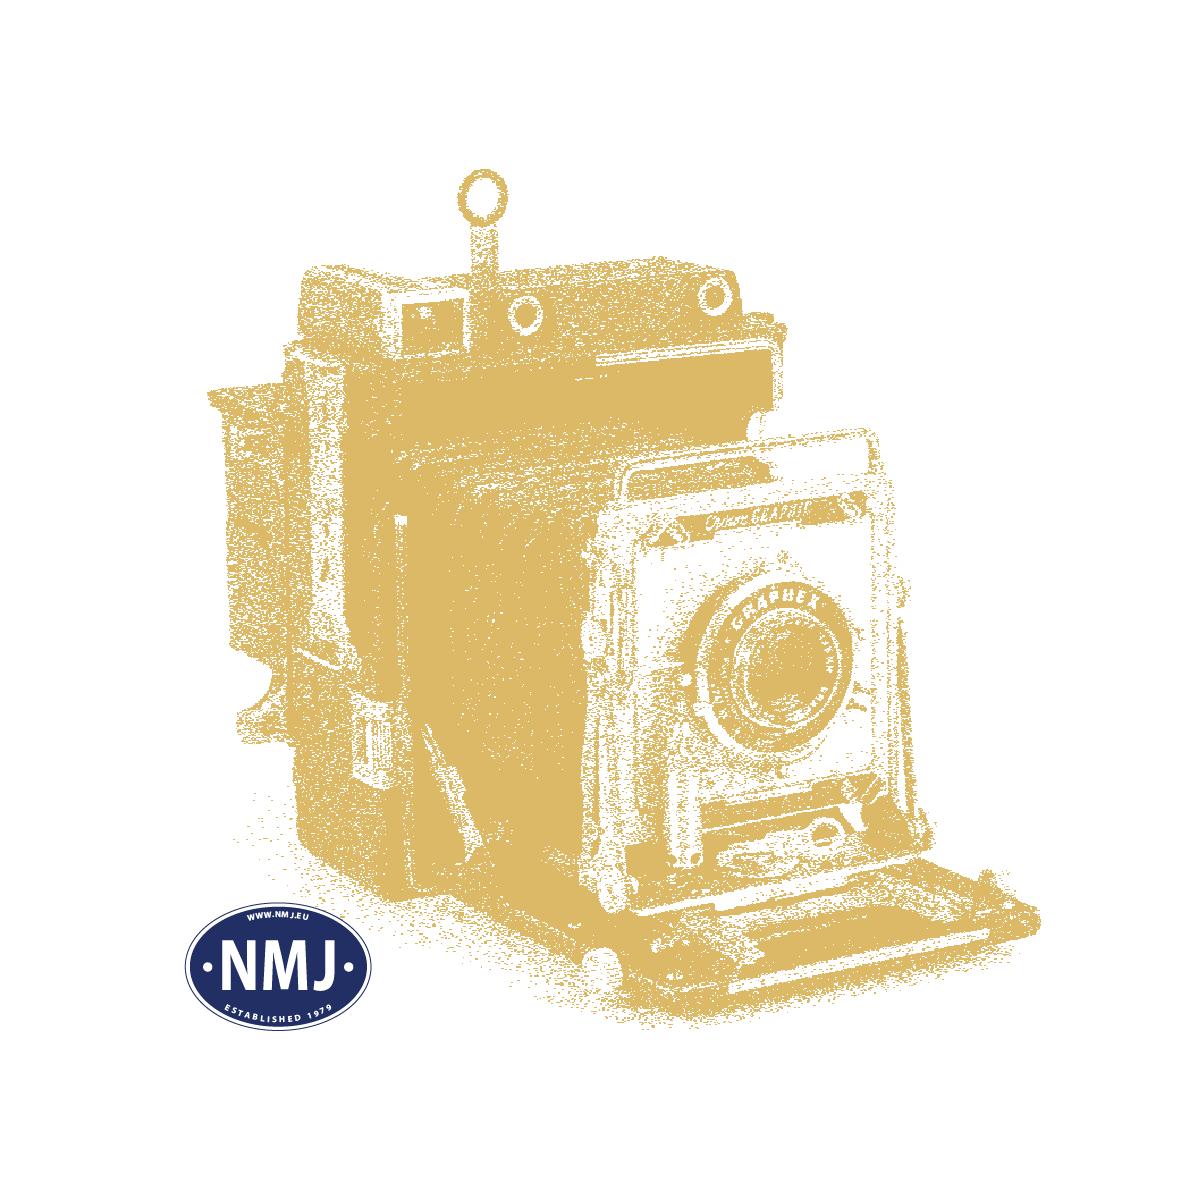 NMJT90014 - NMJ Topline NSB Di3a 620, Gammeldesign, DCC m/ Sond